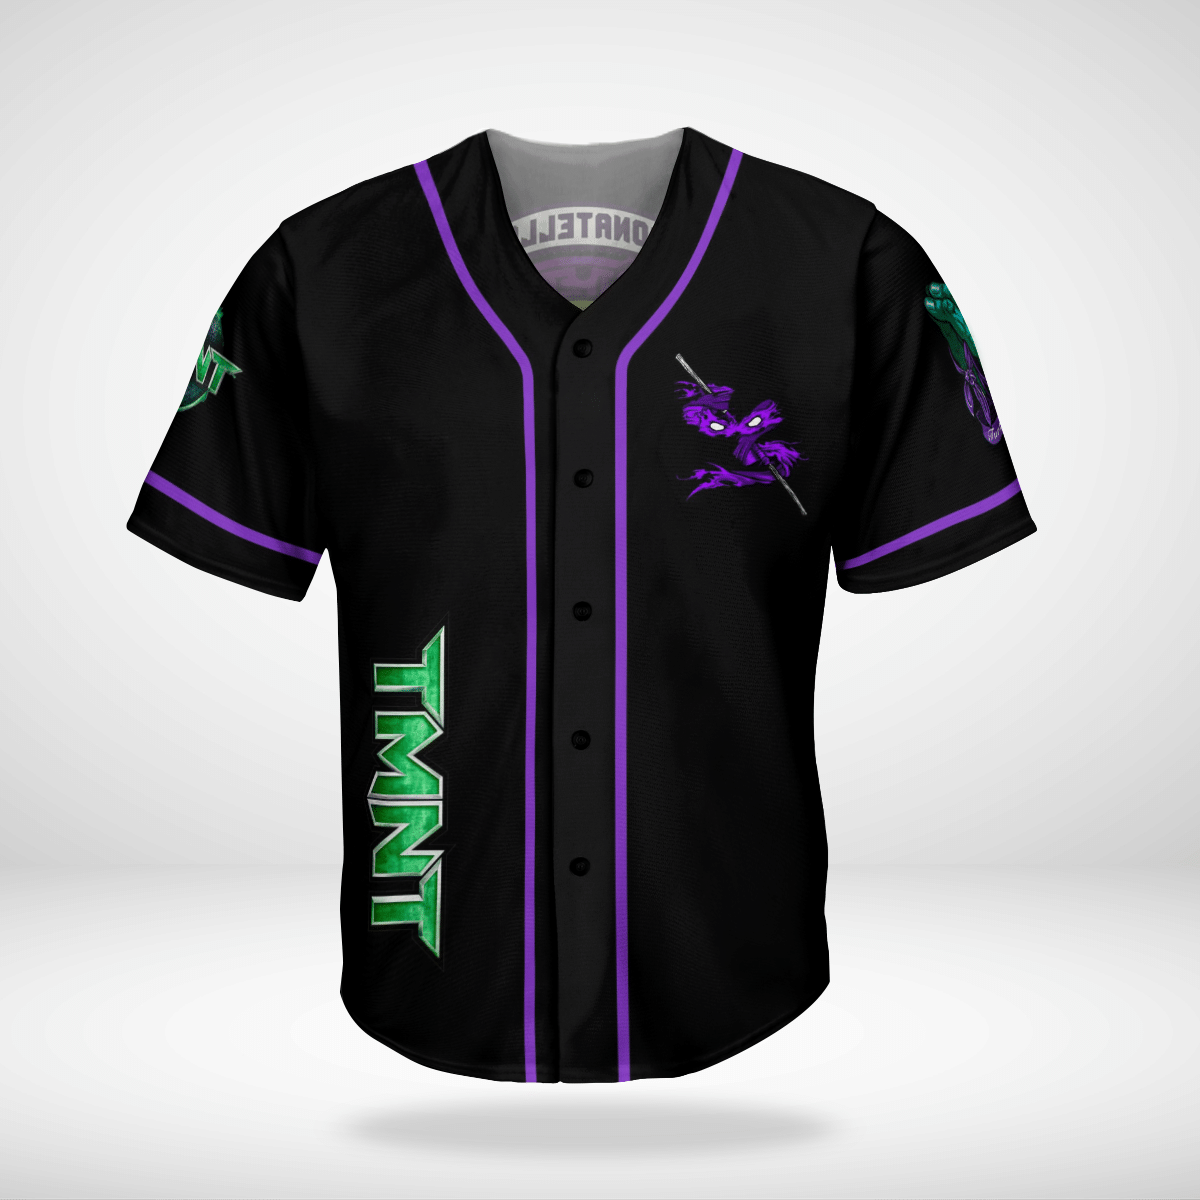 Donatello TMNT Ninja Turtles baseball Jersey shirt